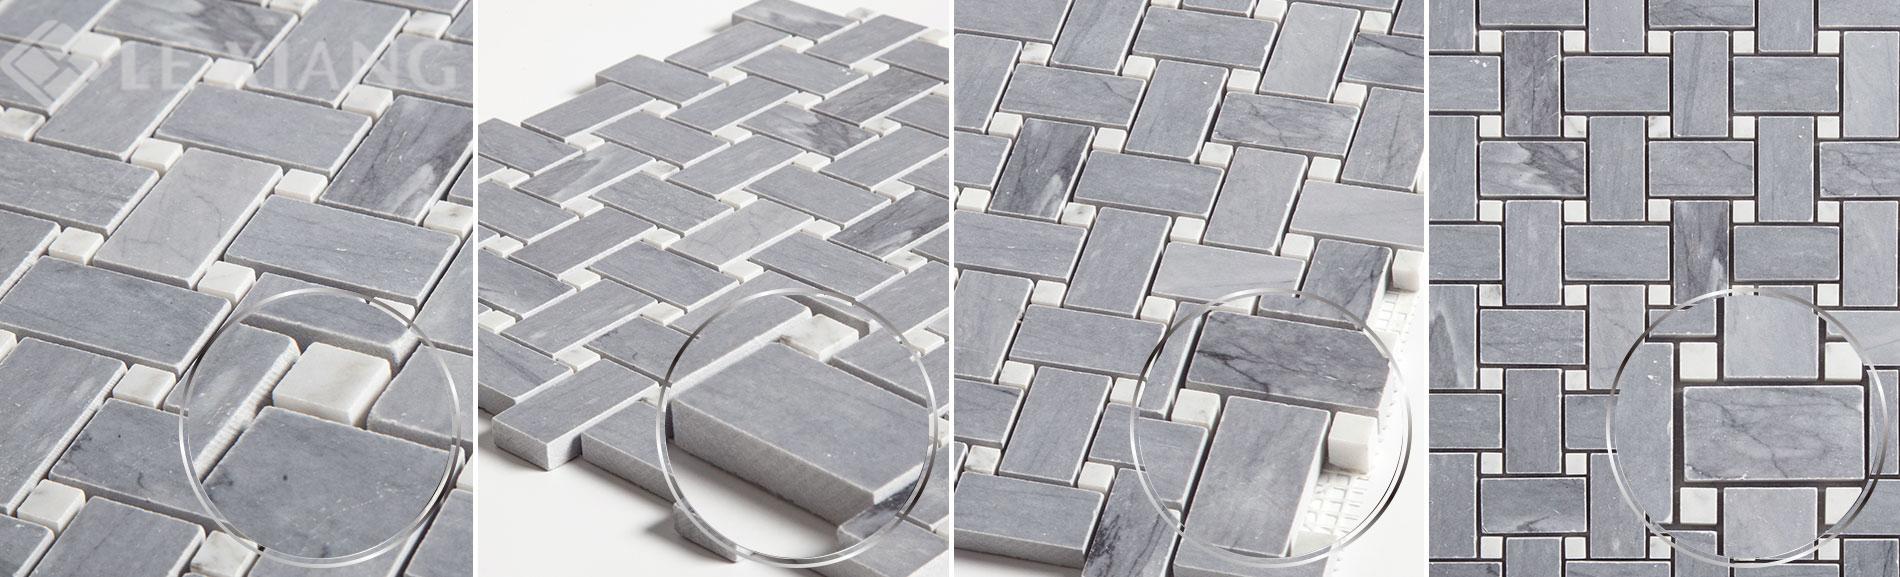 Gray-Marble-Basketweave-Mosaic-Tile-Kitchen-Backsplash-Gray-4